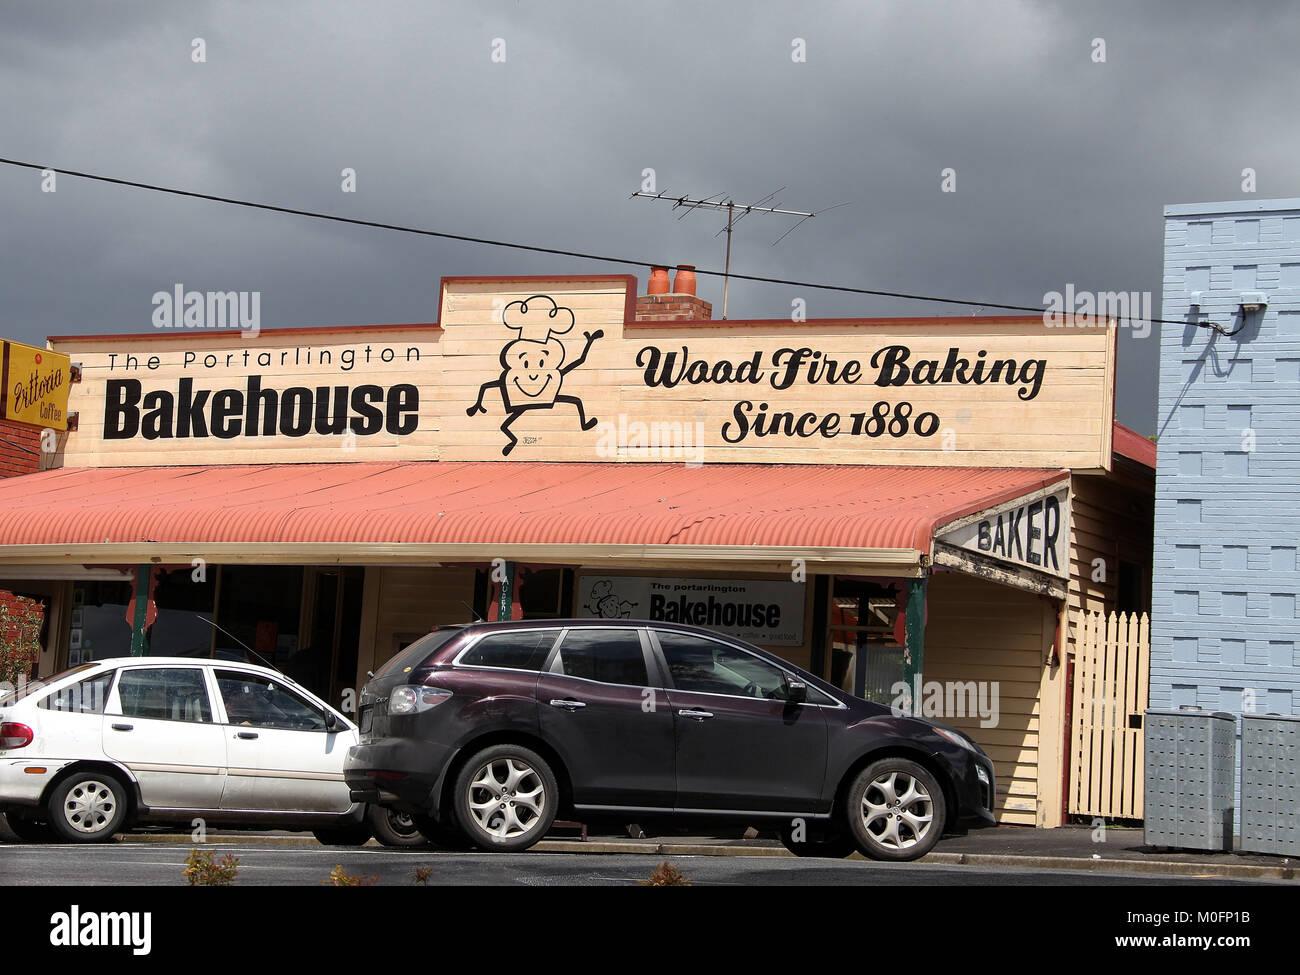 Portarlington Bakehouse in Australia - Stock Image